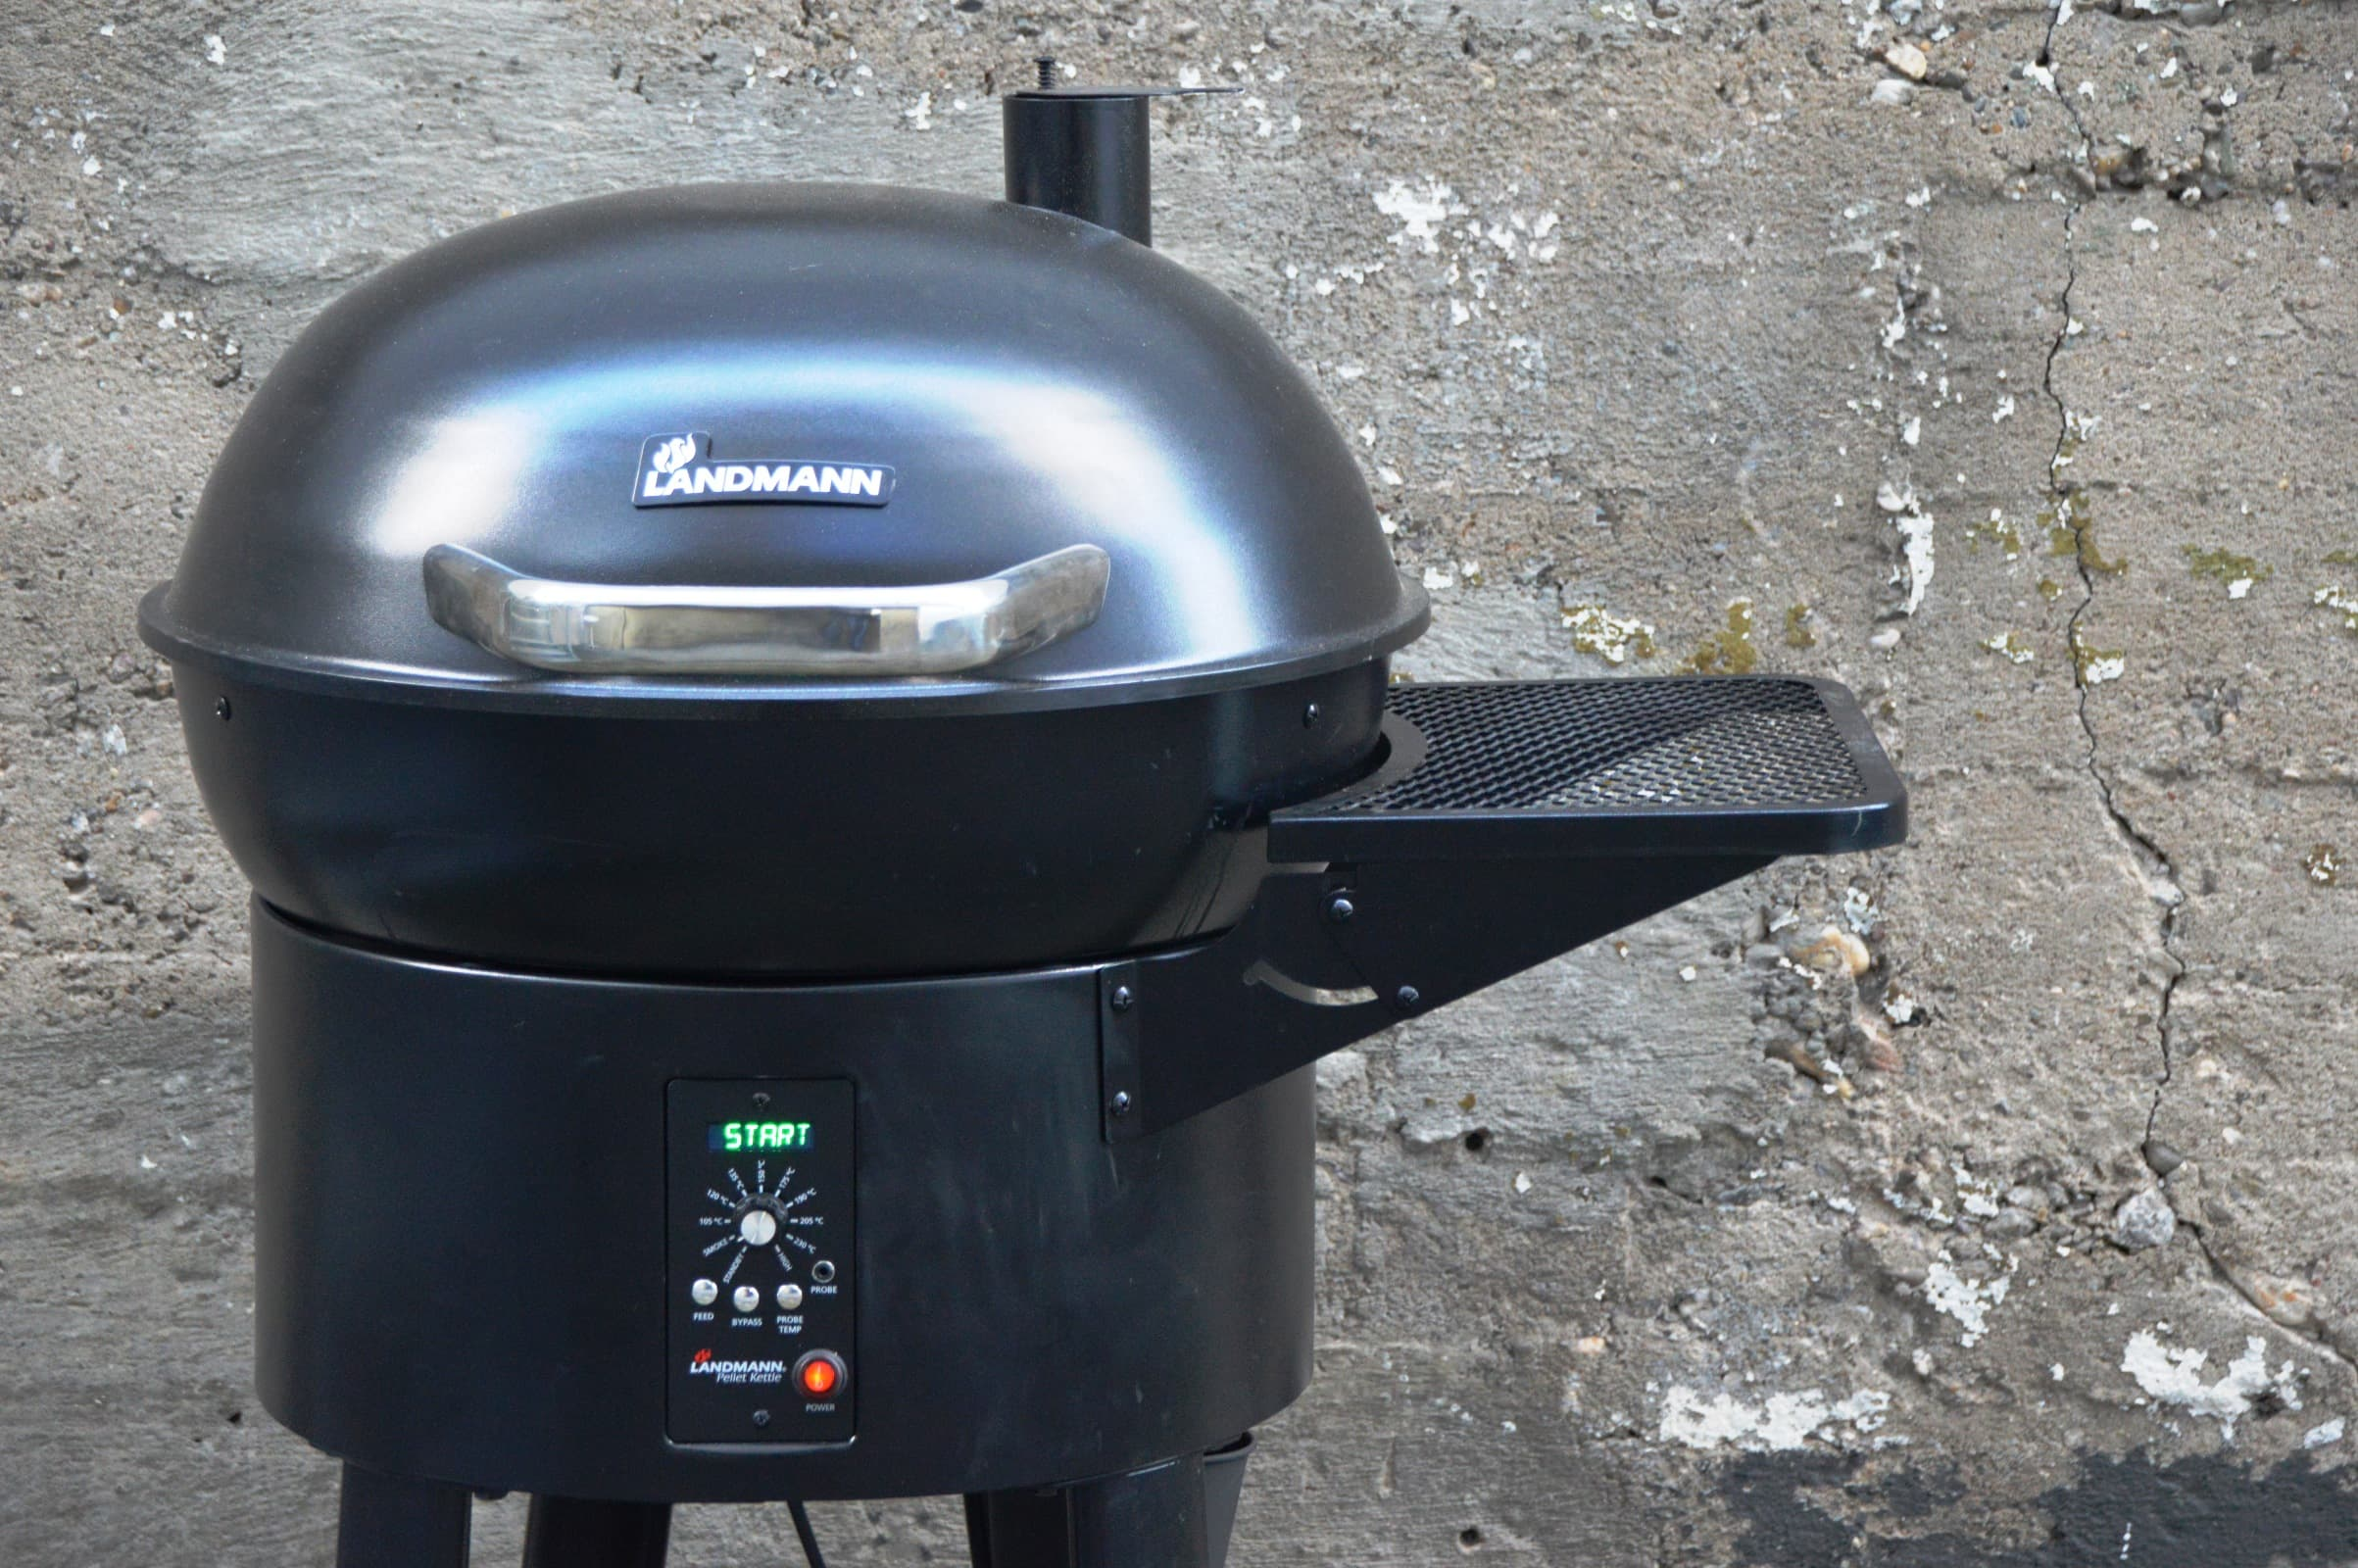 Landmann Gasgrill Rezepte : Angegrillt landmann pellet kettle im test bacon zum steak